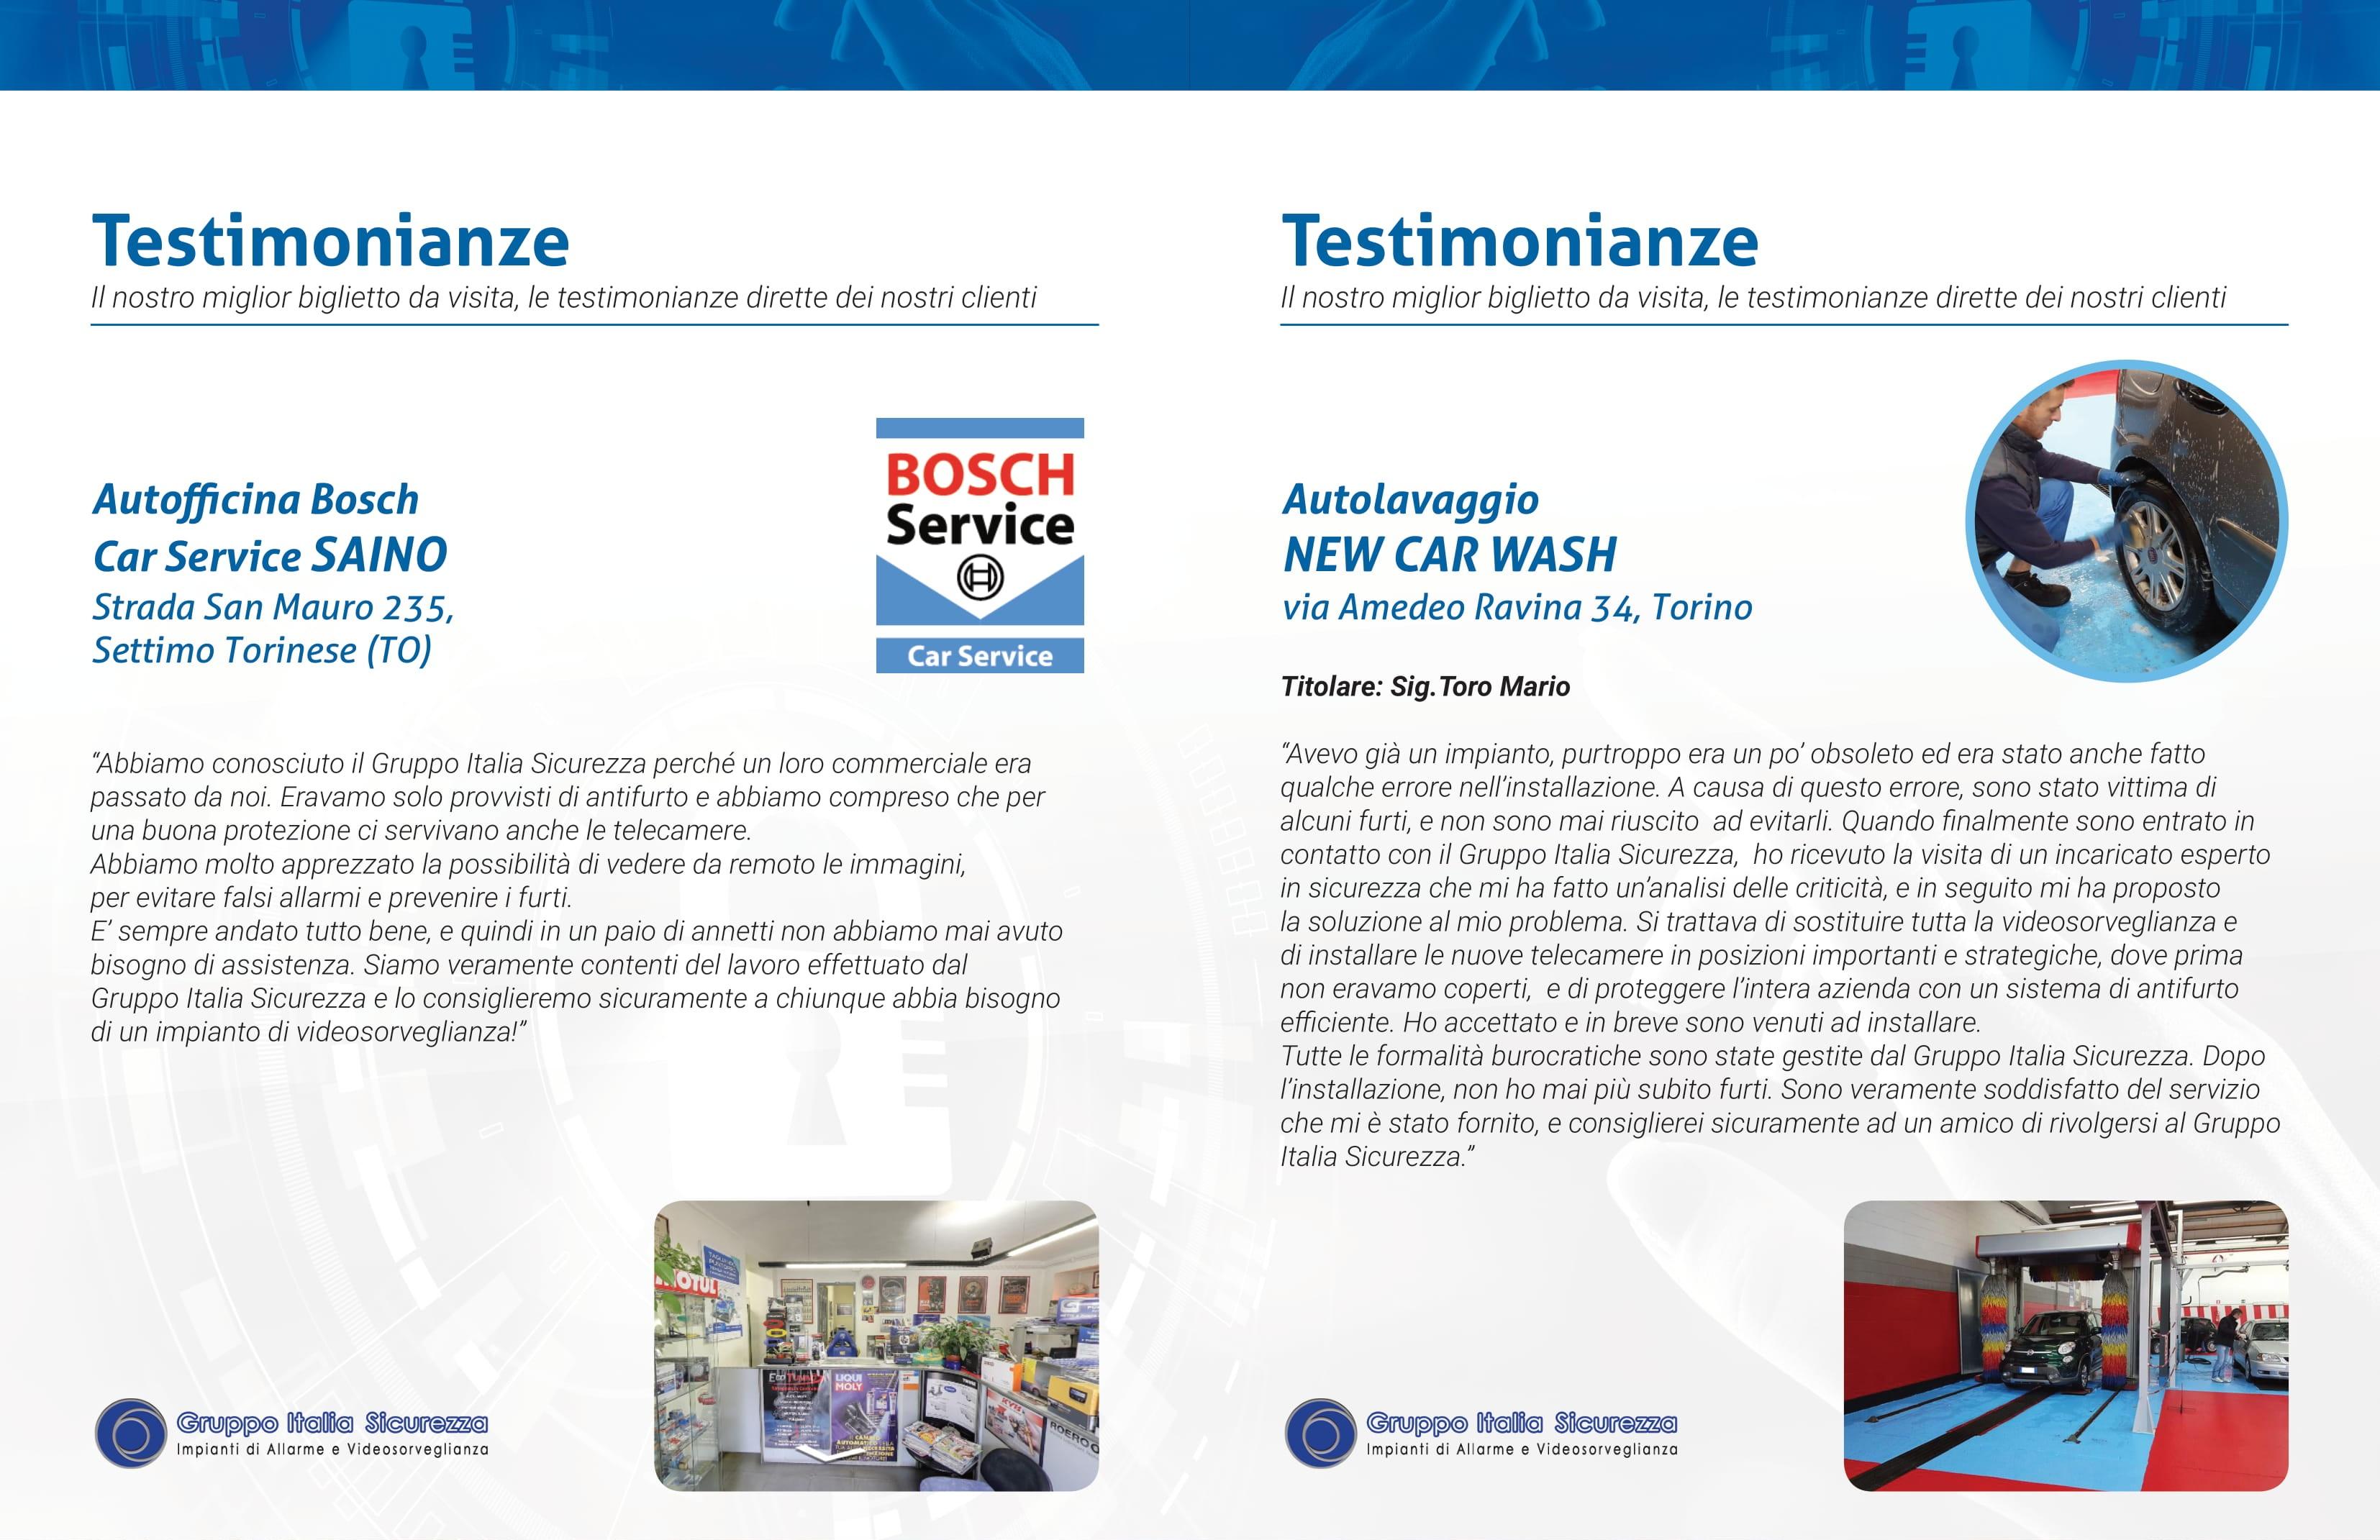 GIS-Catalogo-A4-LAST_012-012-1